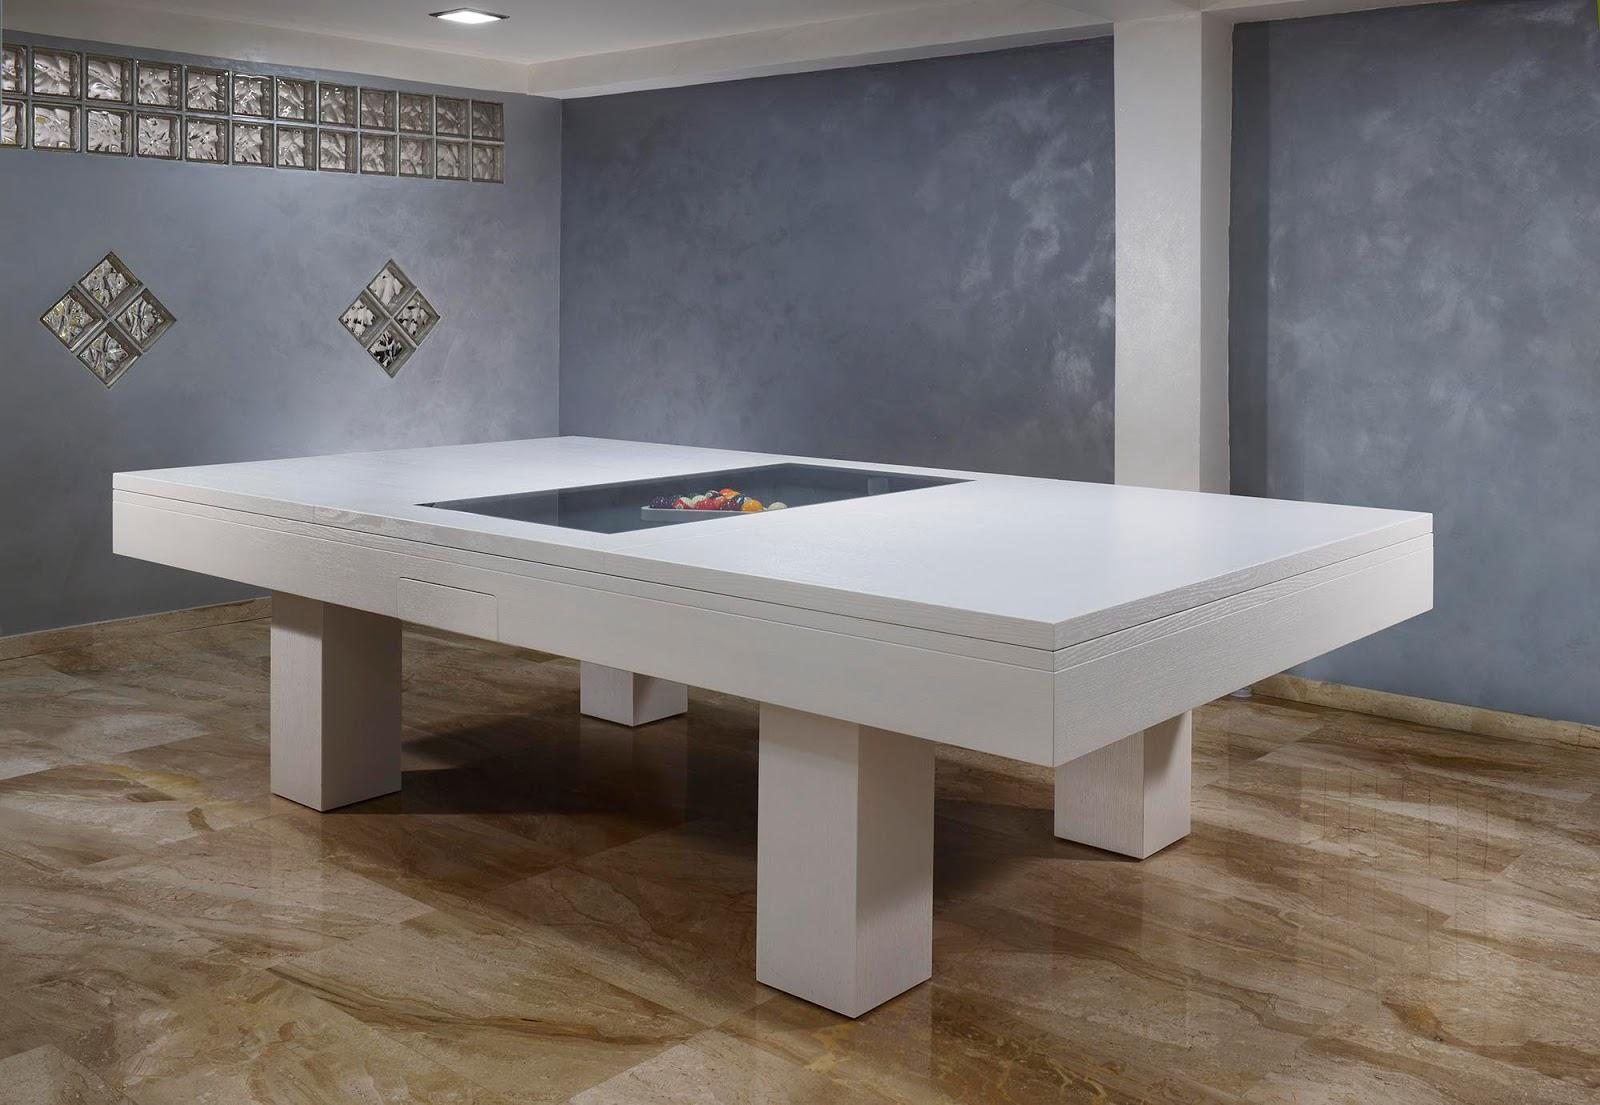 Tavolo biliardo da arredamento casa moderna roma italy tavoli da biliardo per casa tavolo - Mini biliardo da tavolo ...